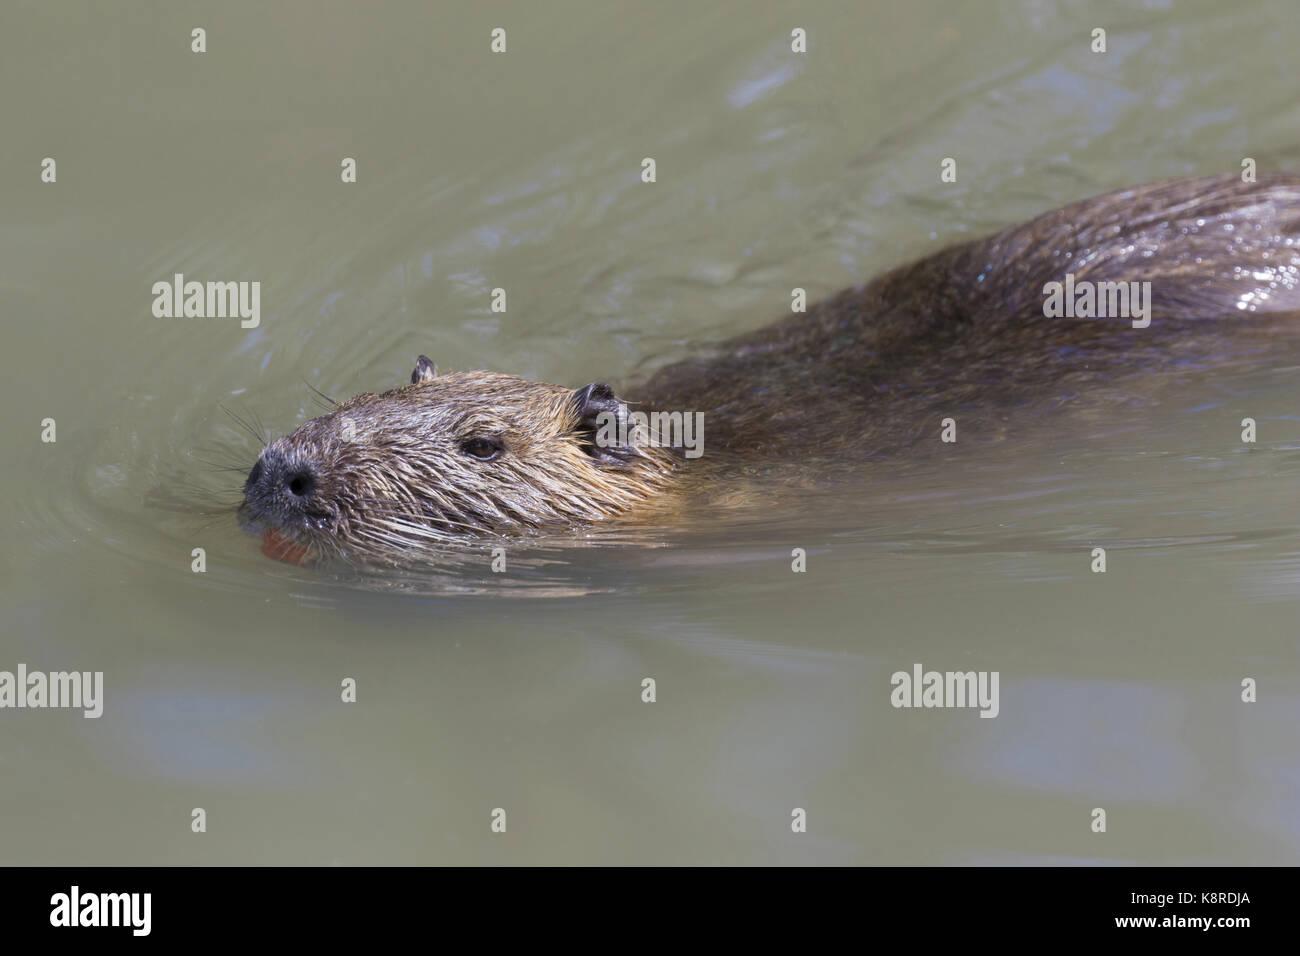 Coypu (Myocastor coypus) swimming in water, Camargue, Bouches-du-Rh'ne, Provence, France, June - Stock Image